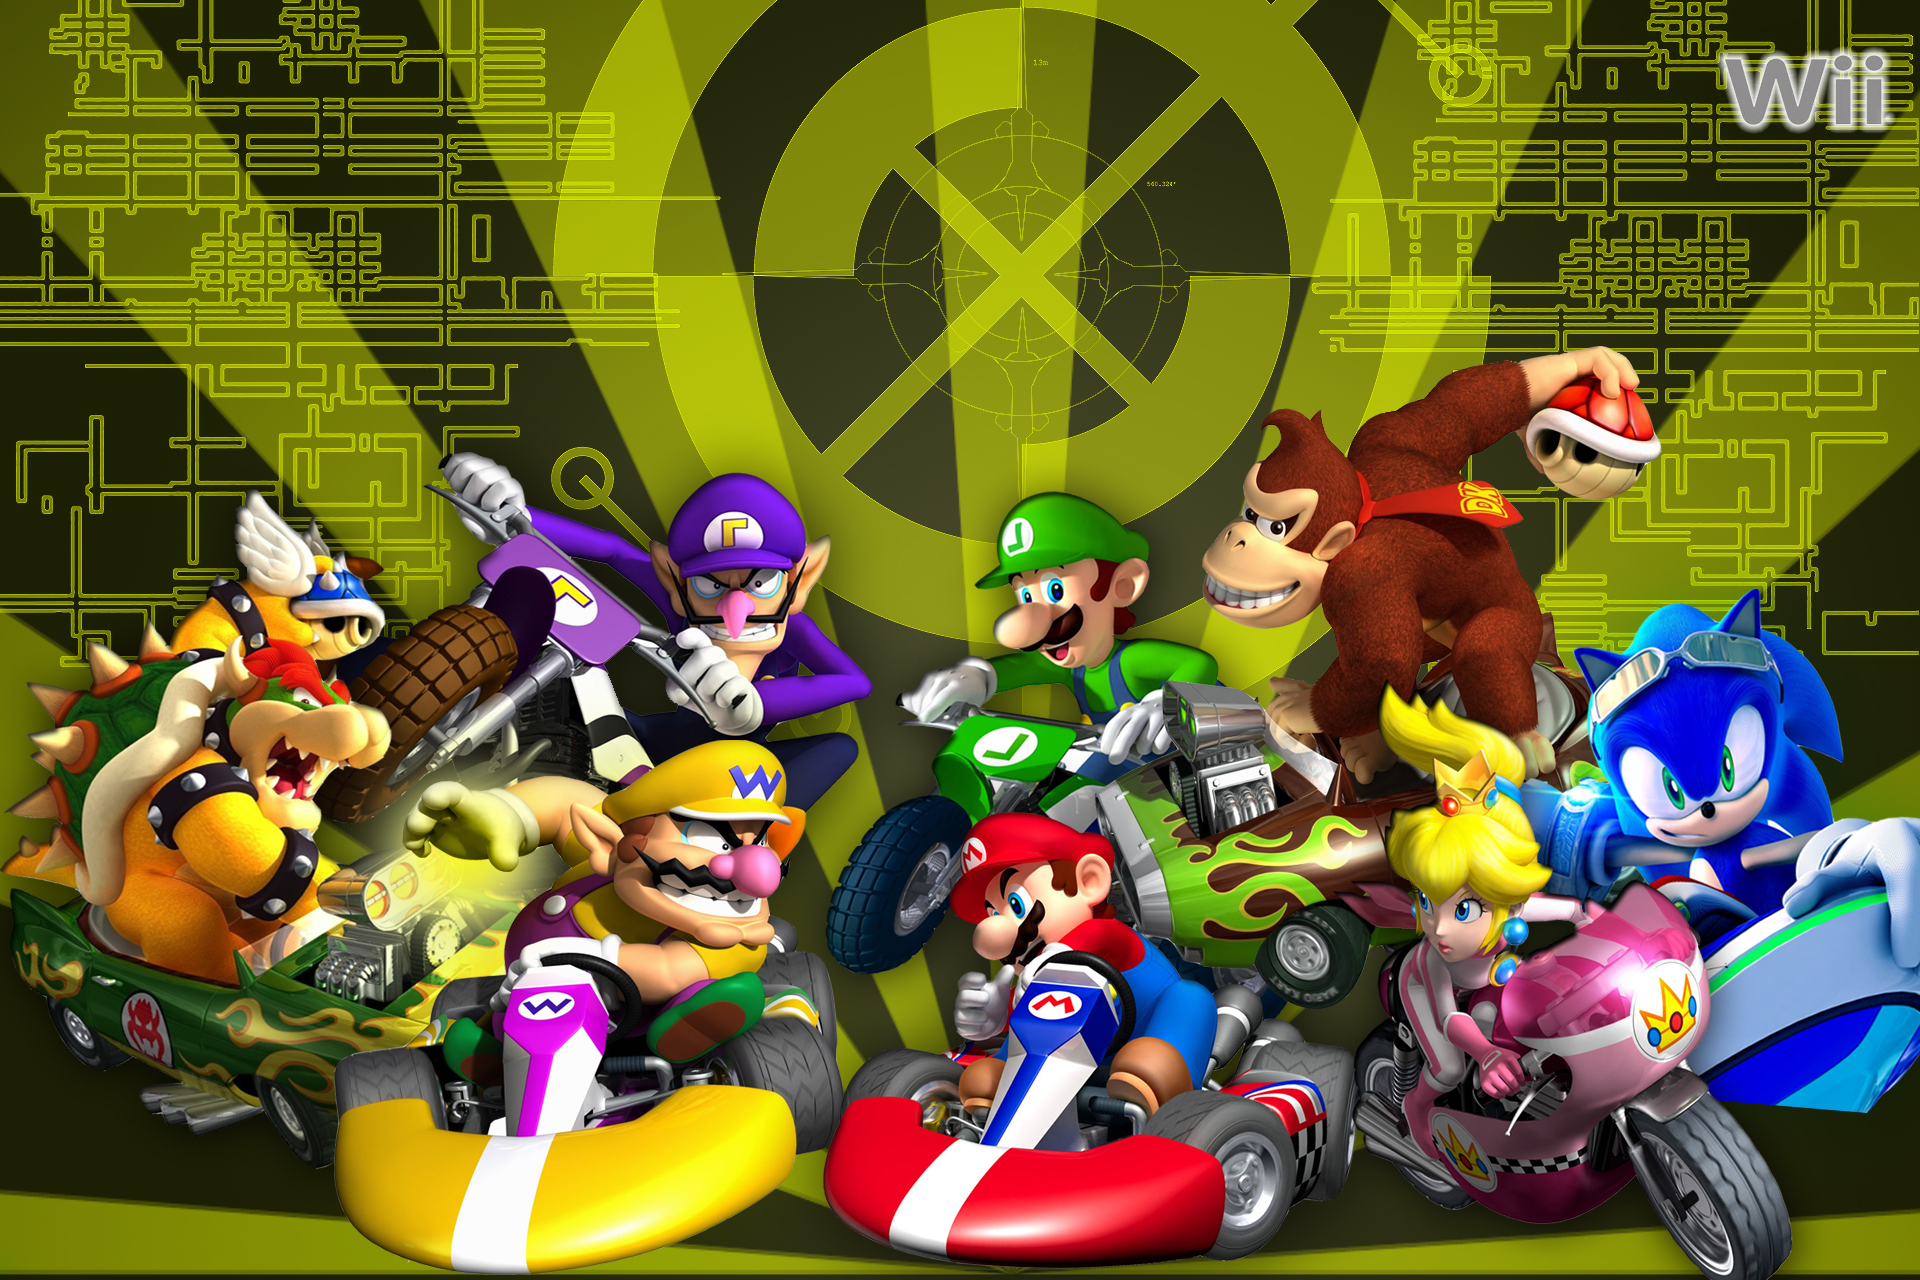 Mario Kart Wii pt. 2 Wallpaper